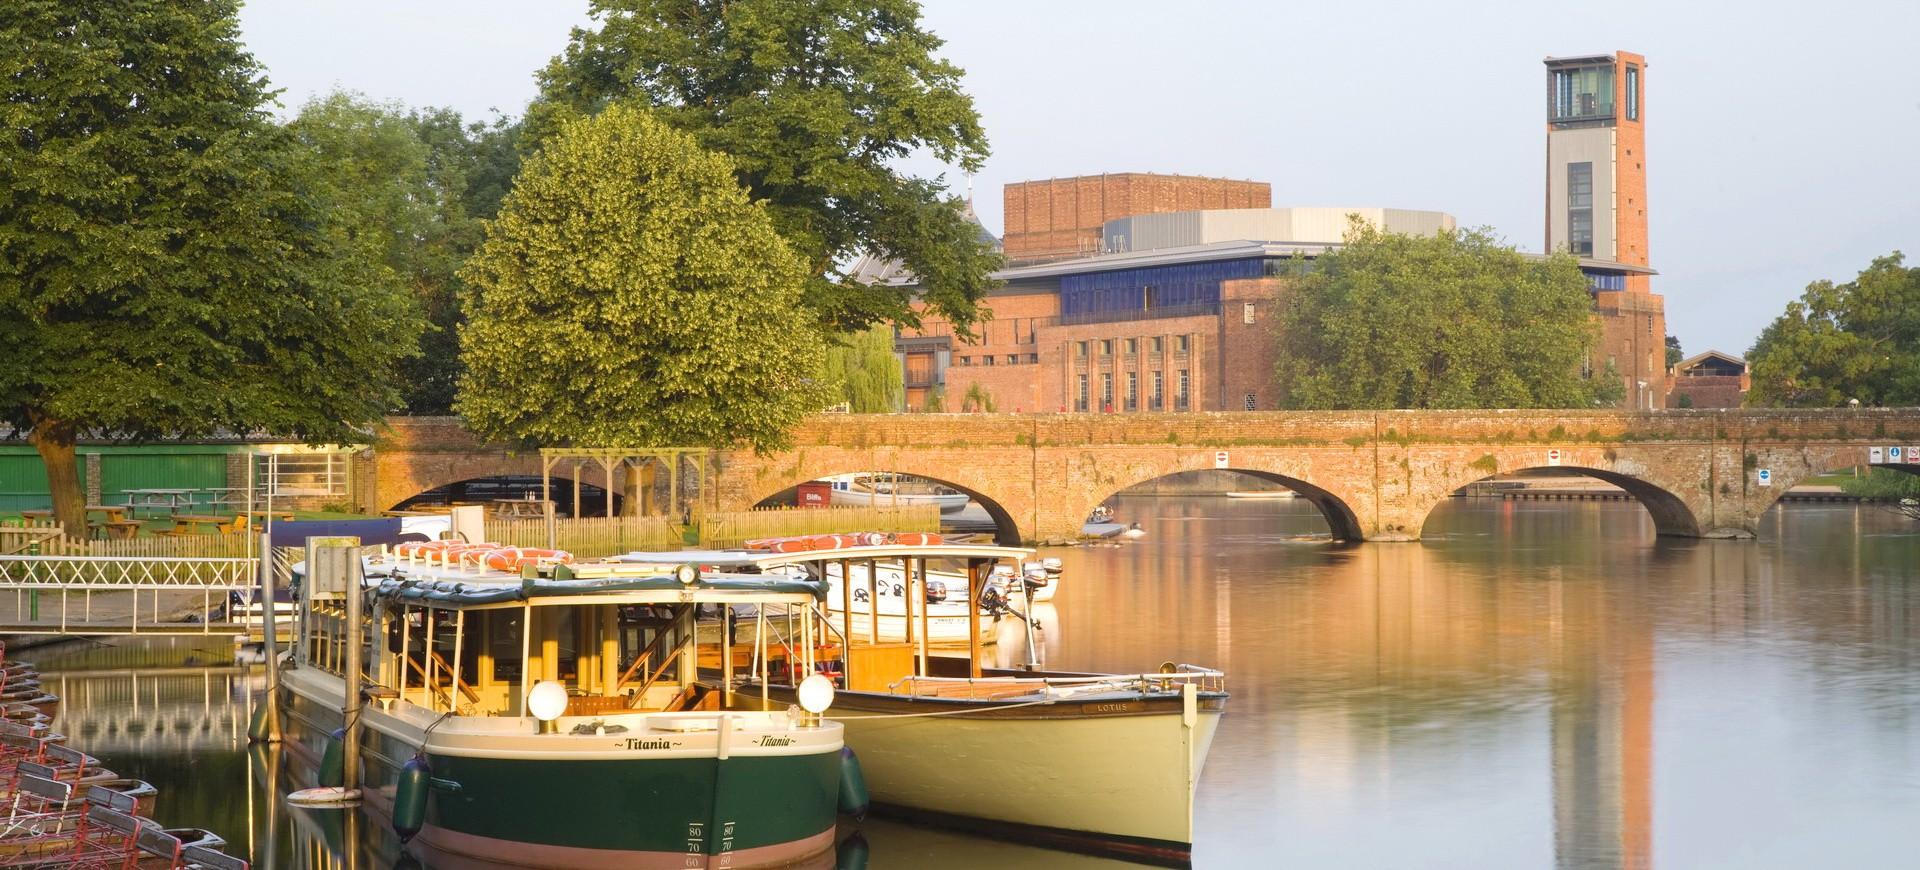 Stratford upon Avon Royal Shakespeare Theatre vu depuis la rivière Avon